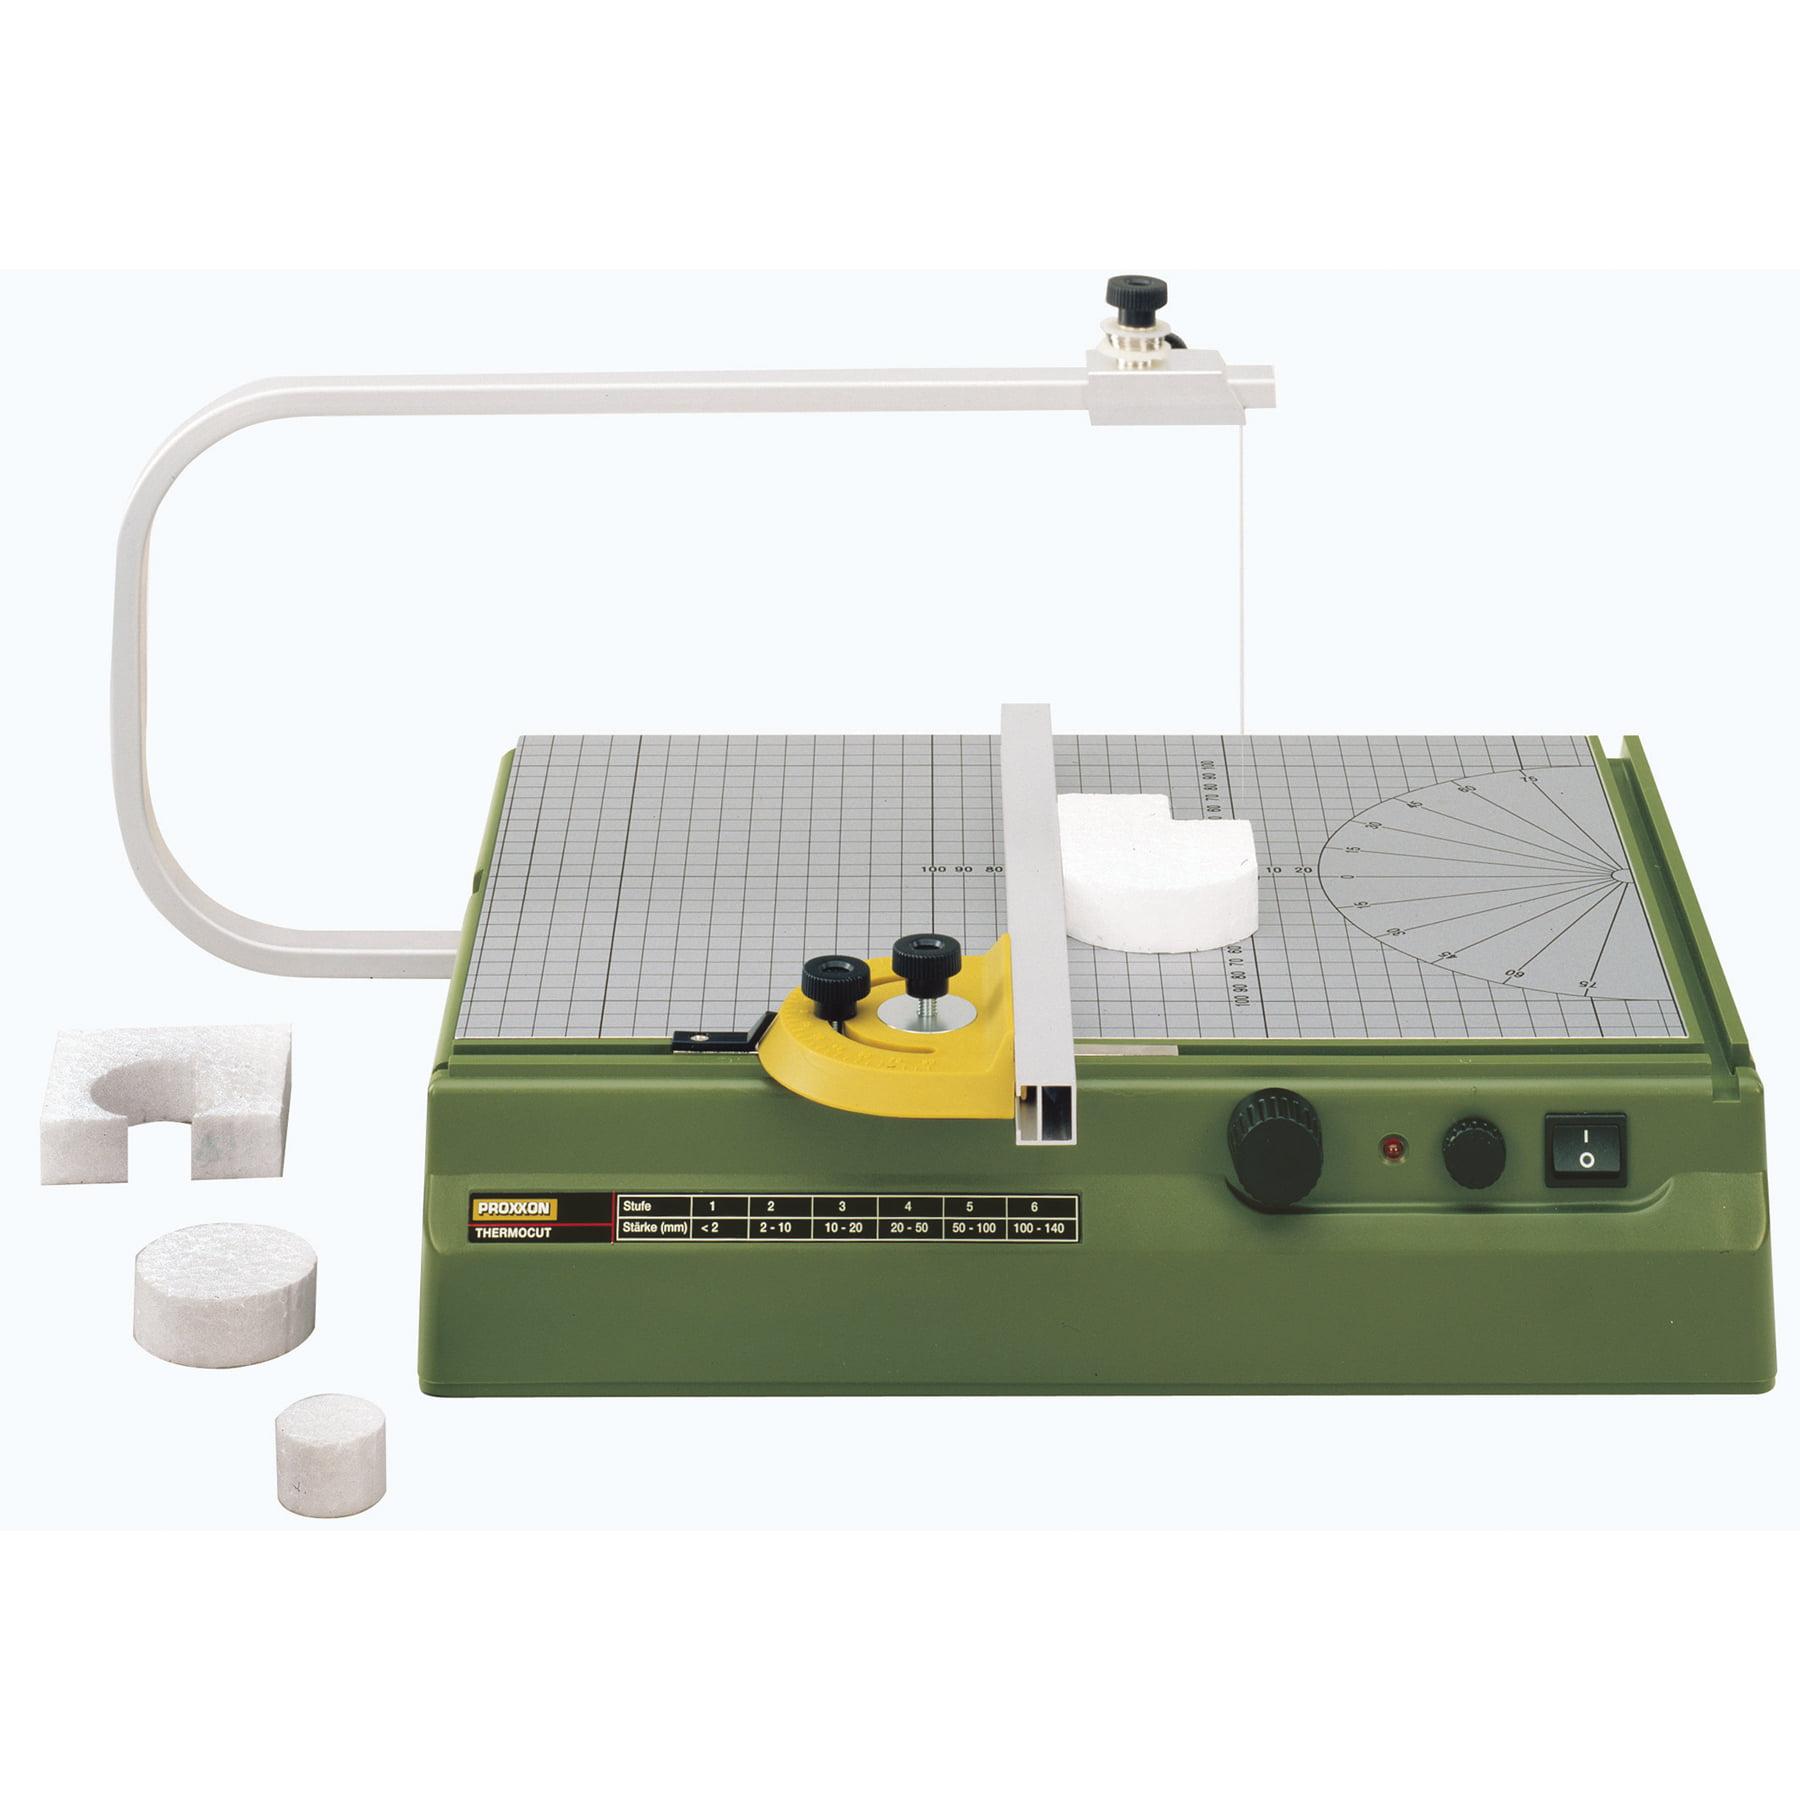 Proxxon 37080 Micromot Hot Wire Cutter Thermocut by PROXXON INC